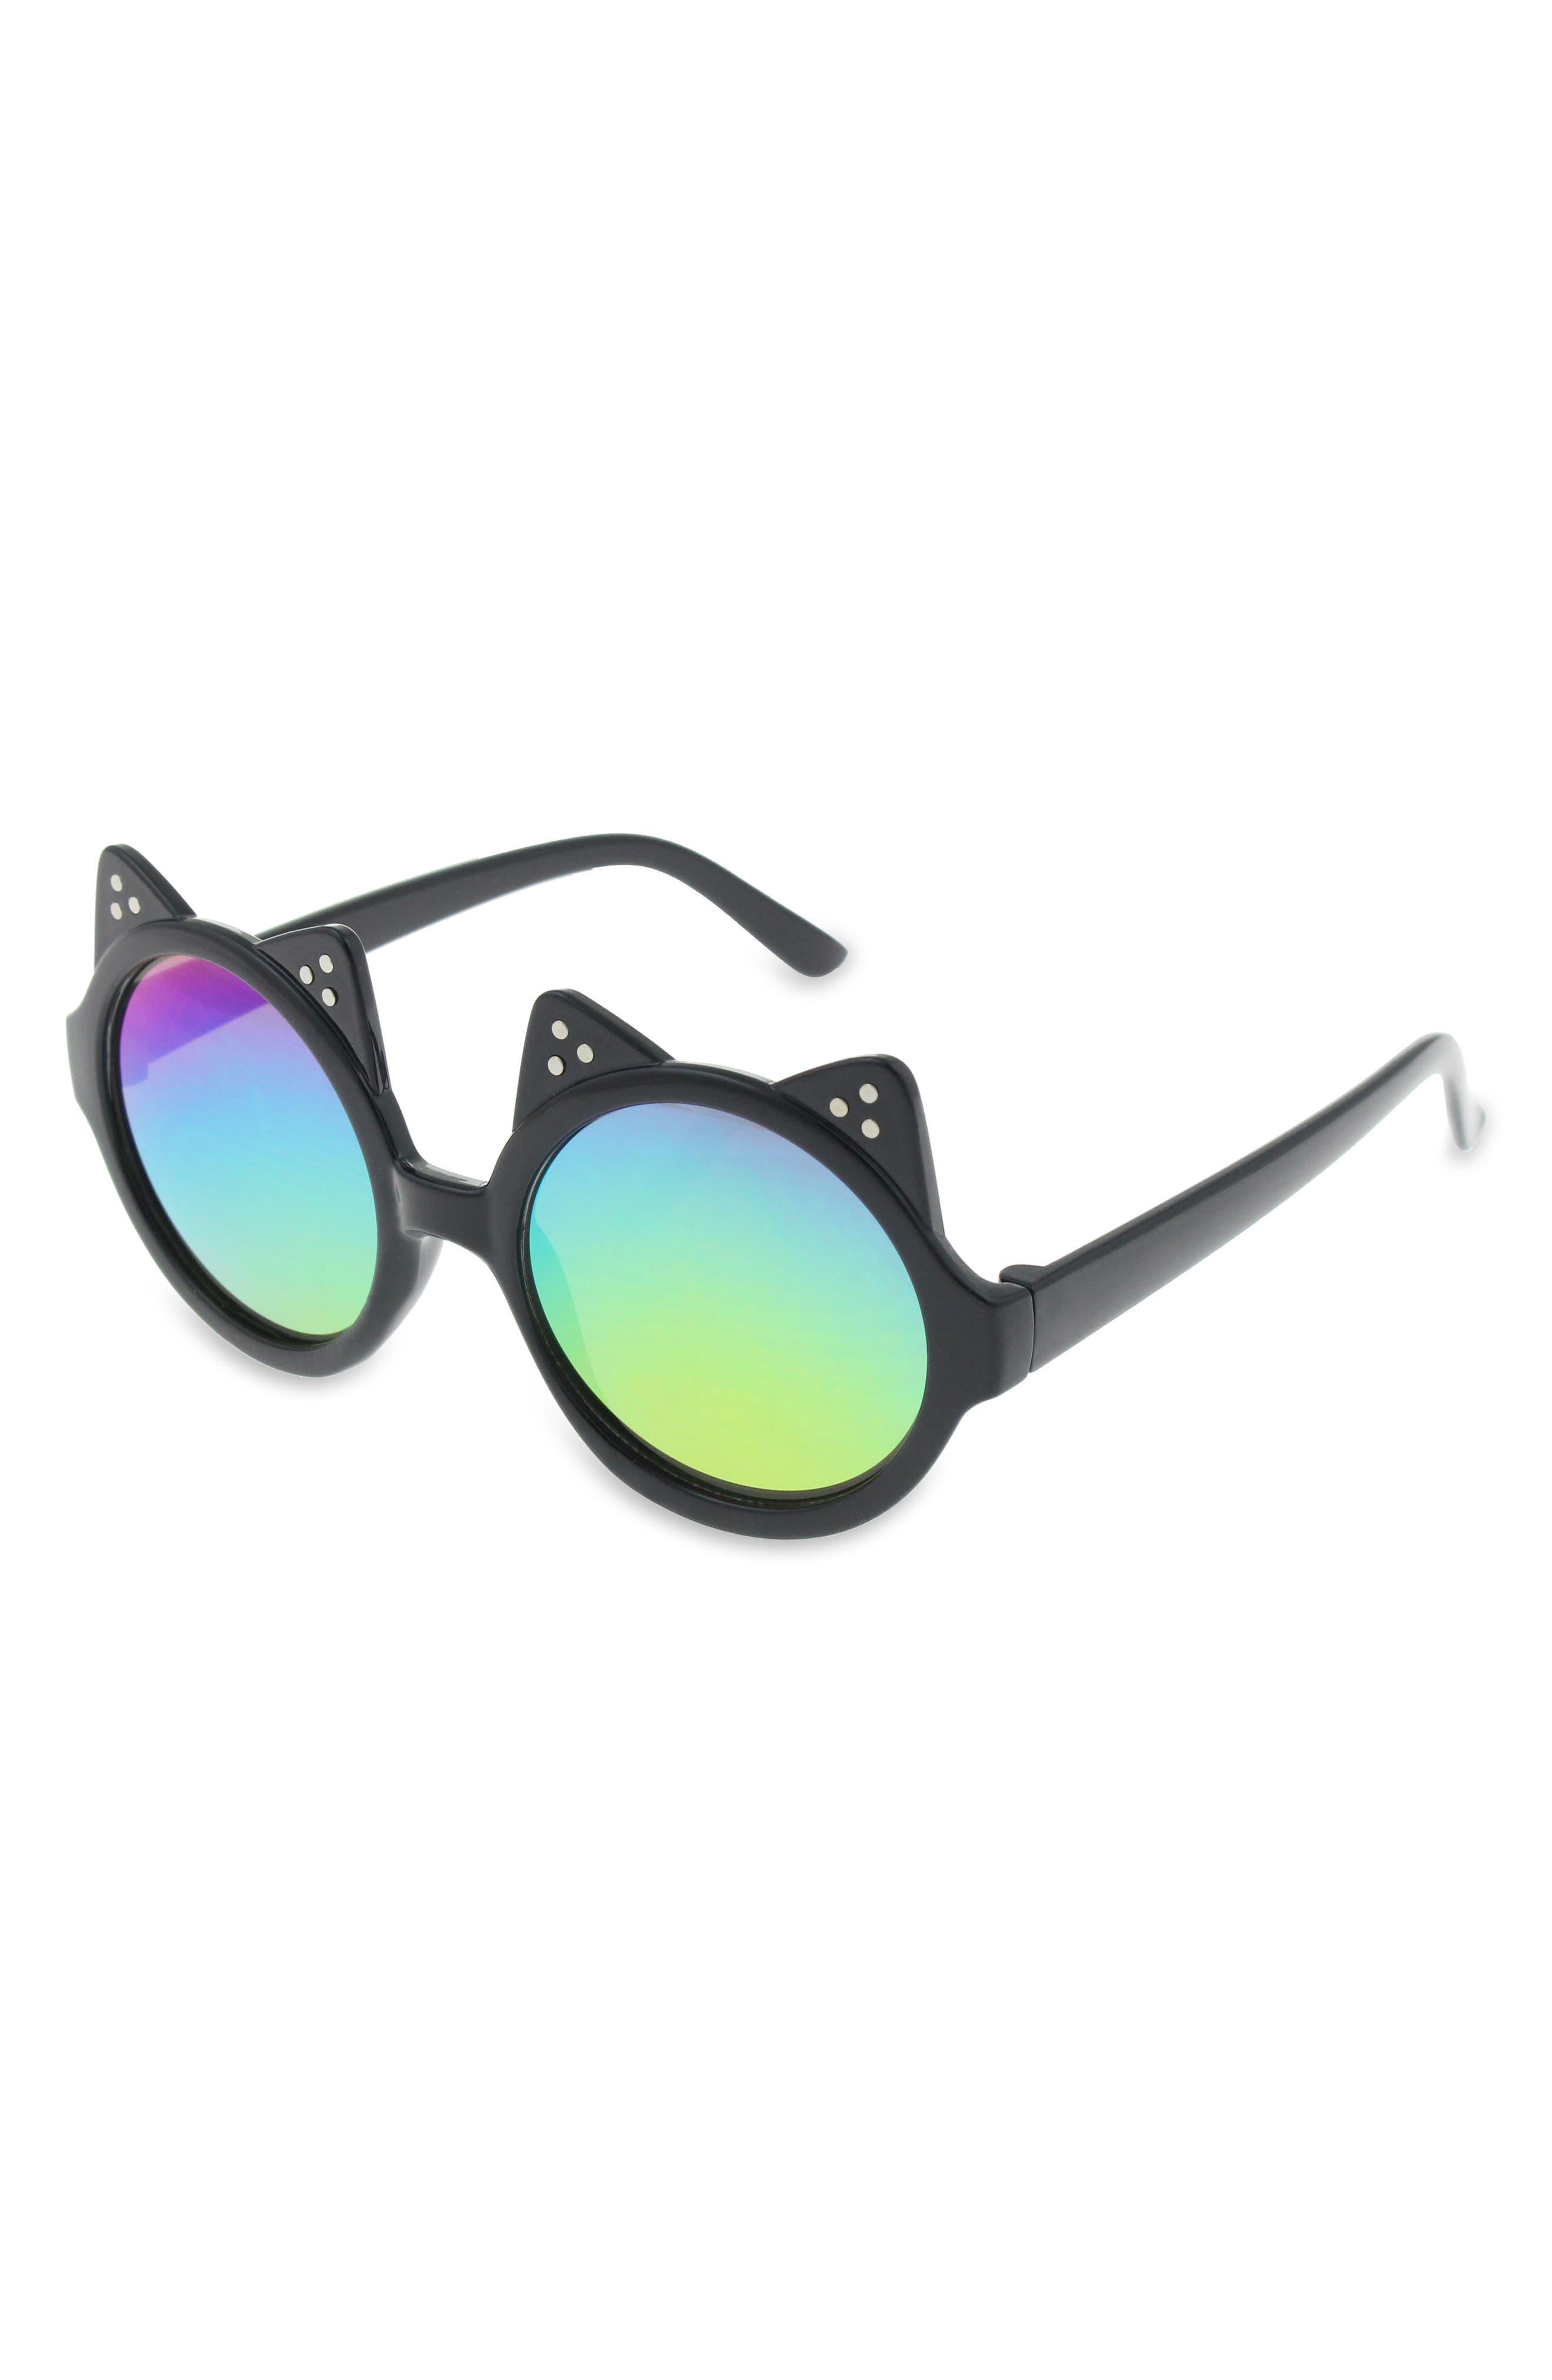 Double Cat Ear Sunglasses,                         Main,                         color, 001